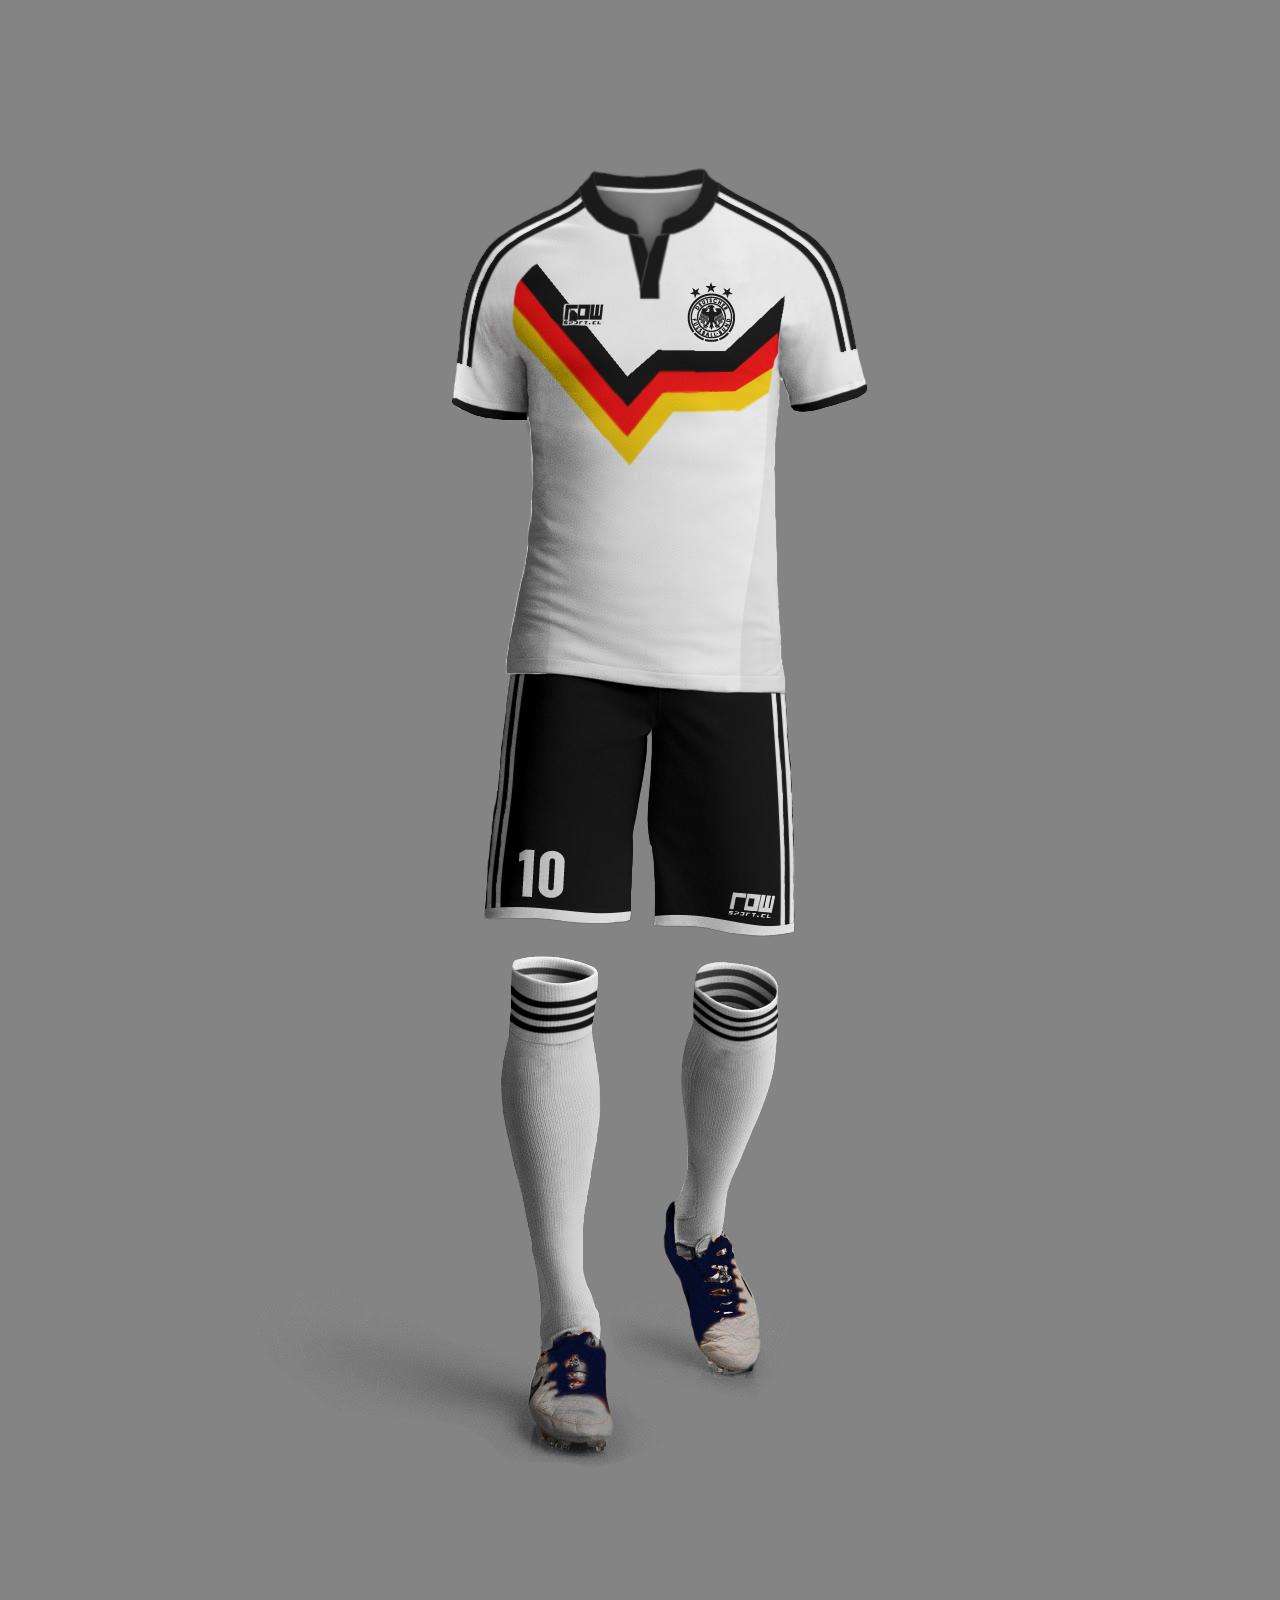 dc182d16e0950 Alemania Retro 1. Camiseta Con Números 12990